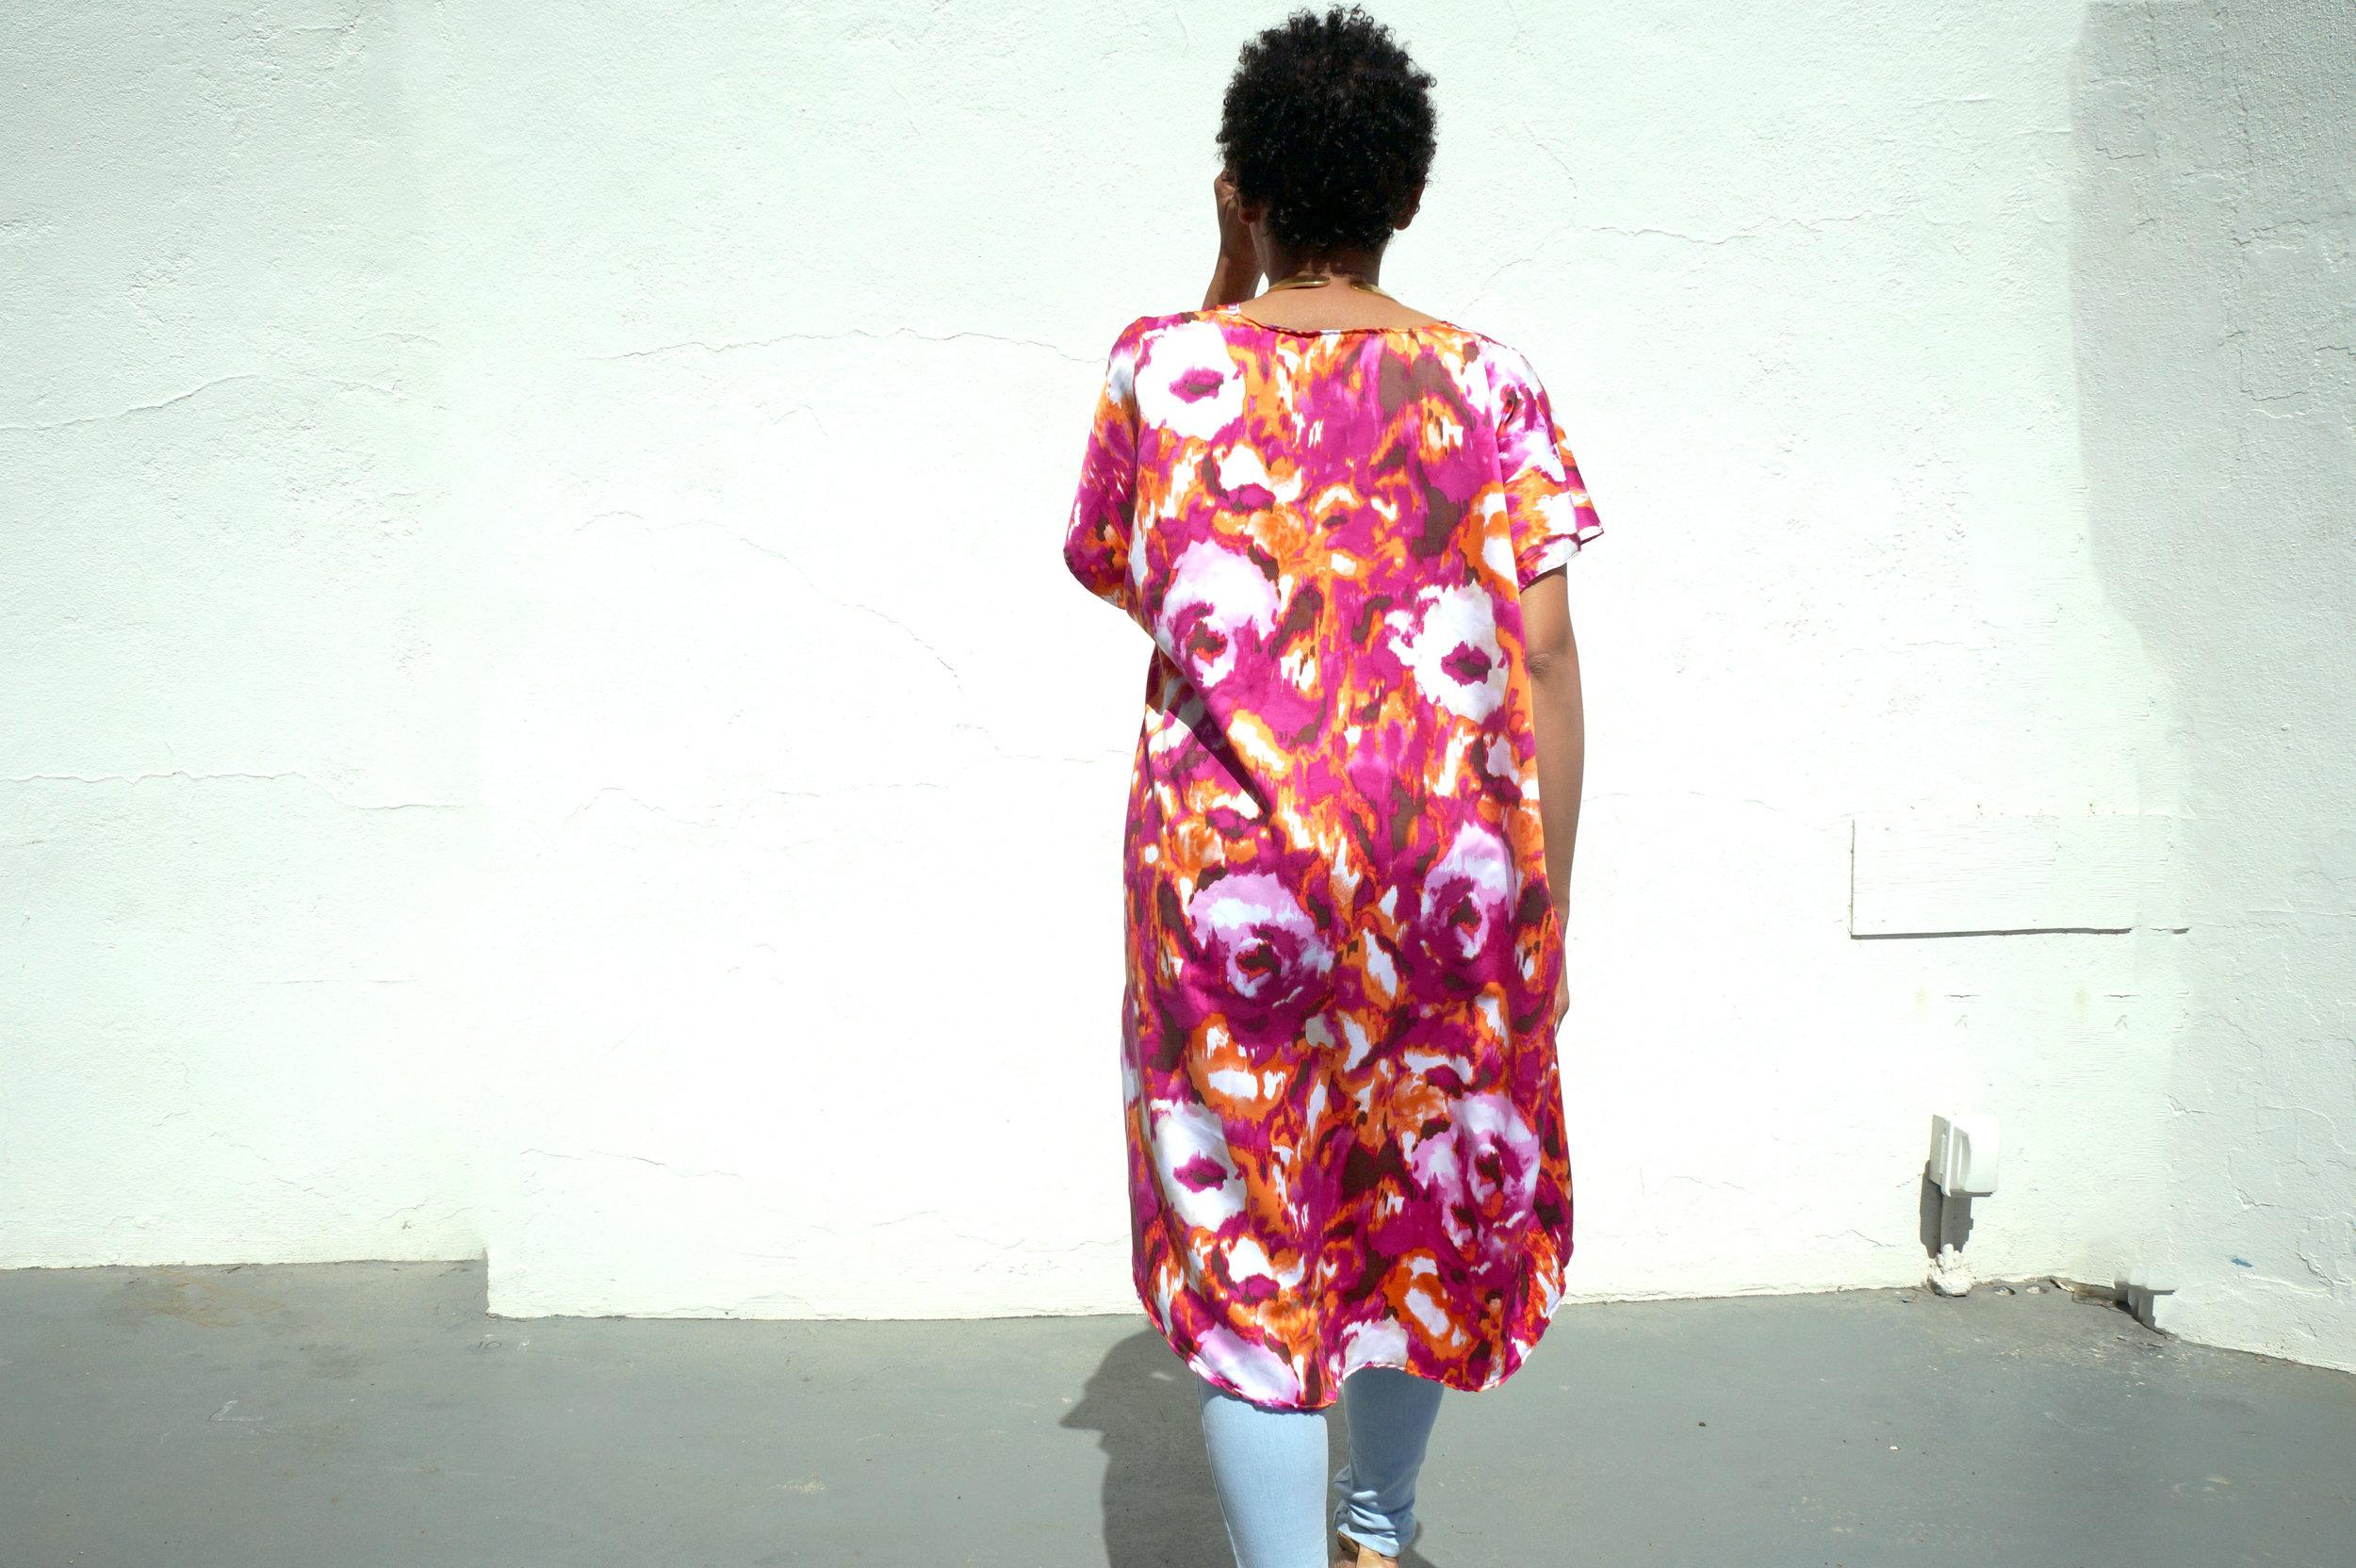 Andrea Fenise Memphis Fashion Blogger styles a kimono outfit